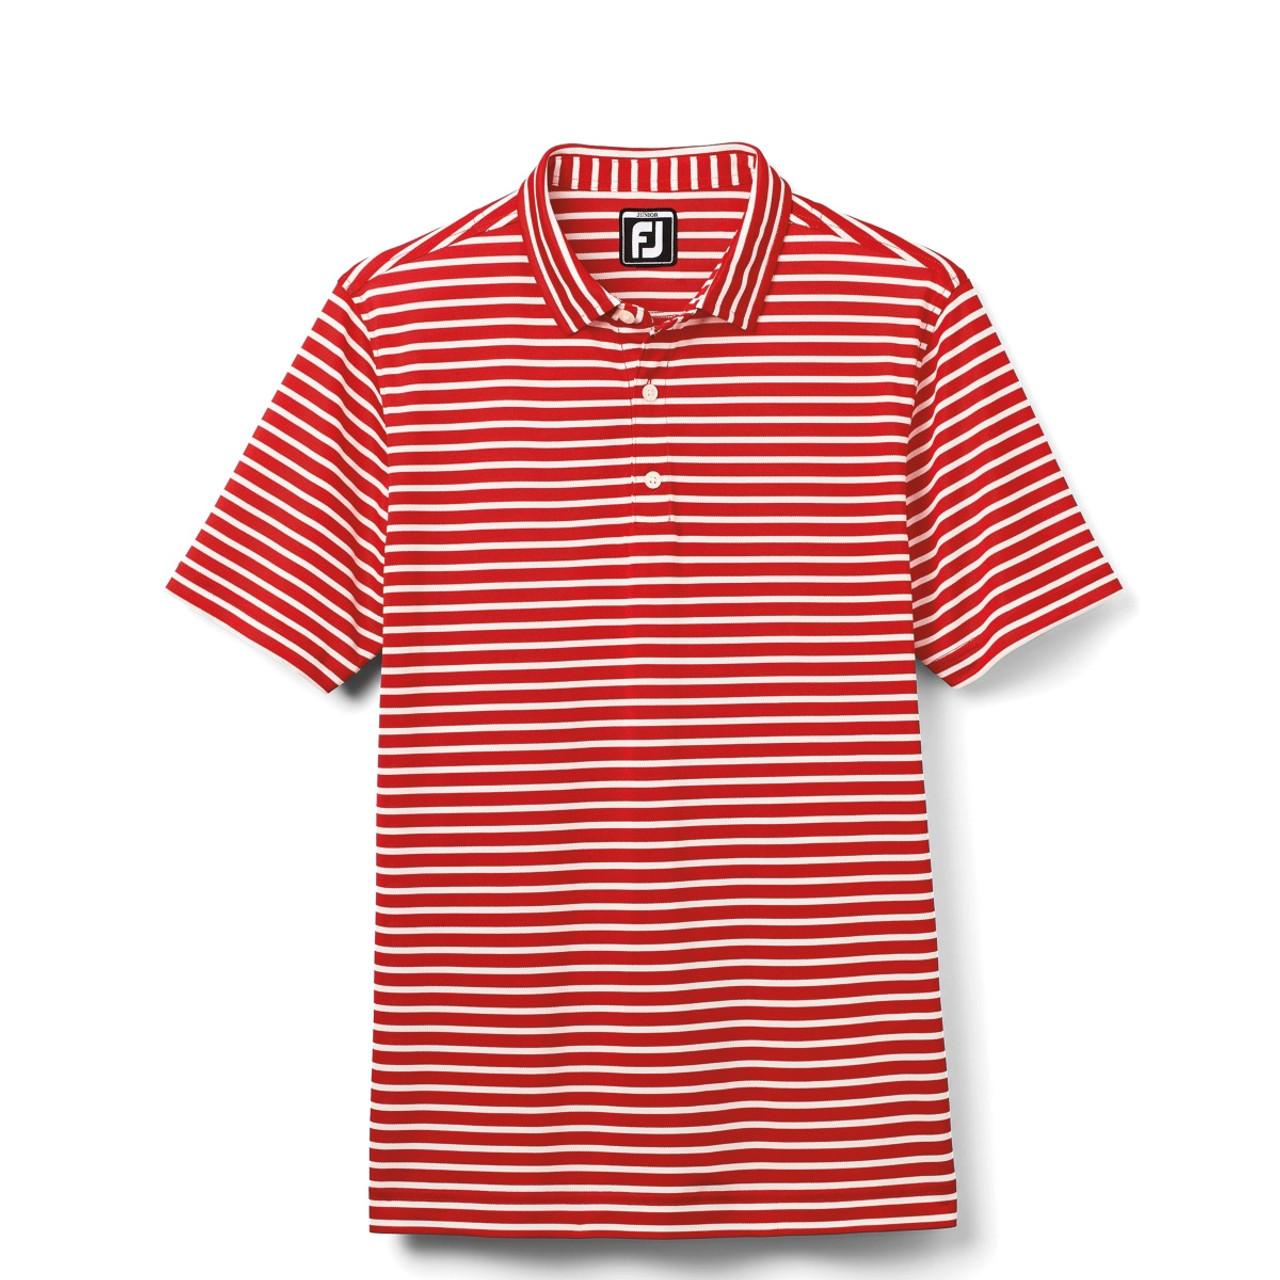 FootJoy Junior Striped Pique Polo - Red / White (26636)